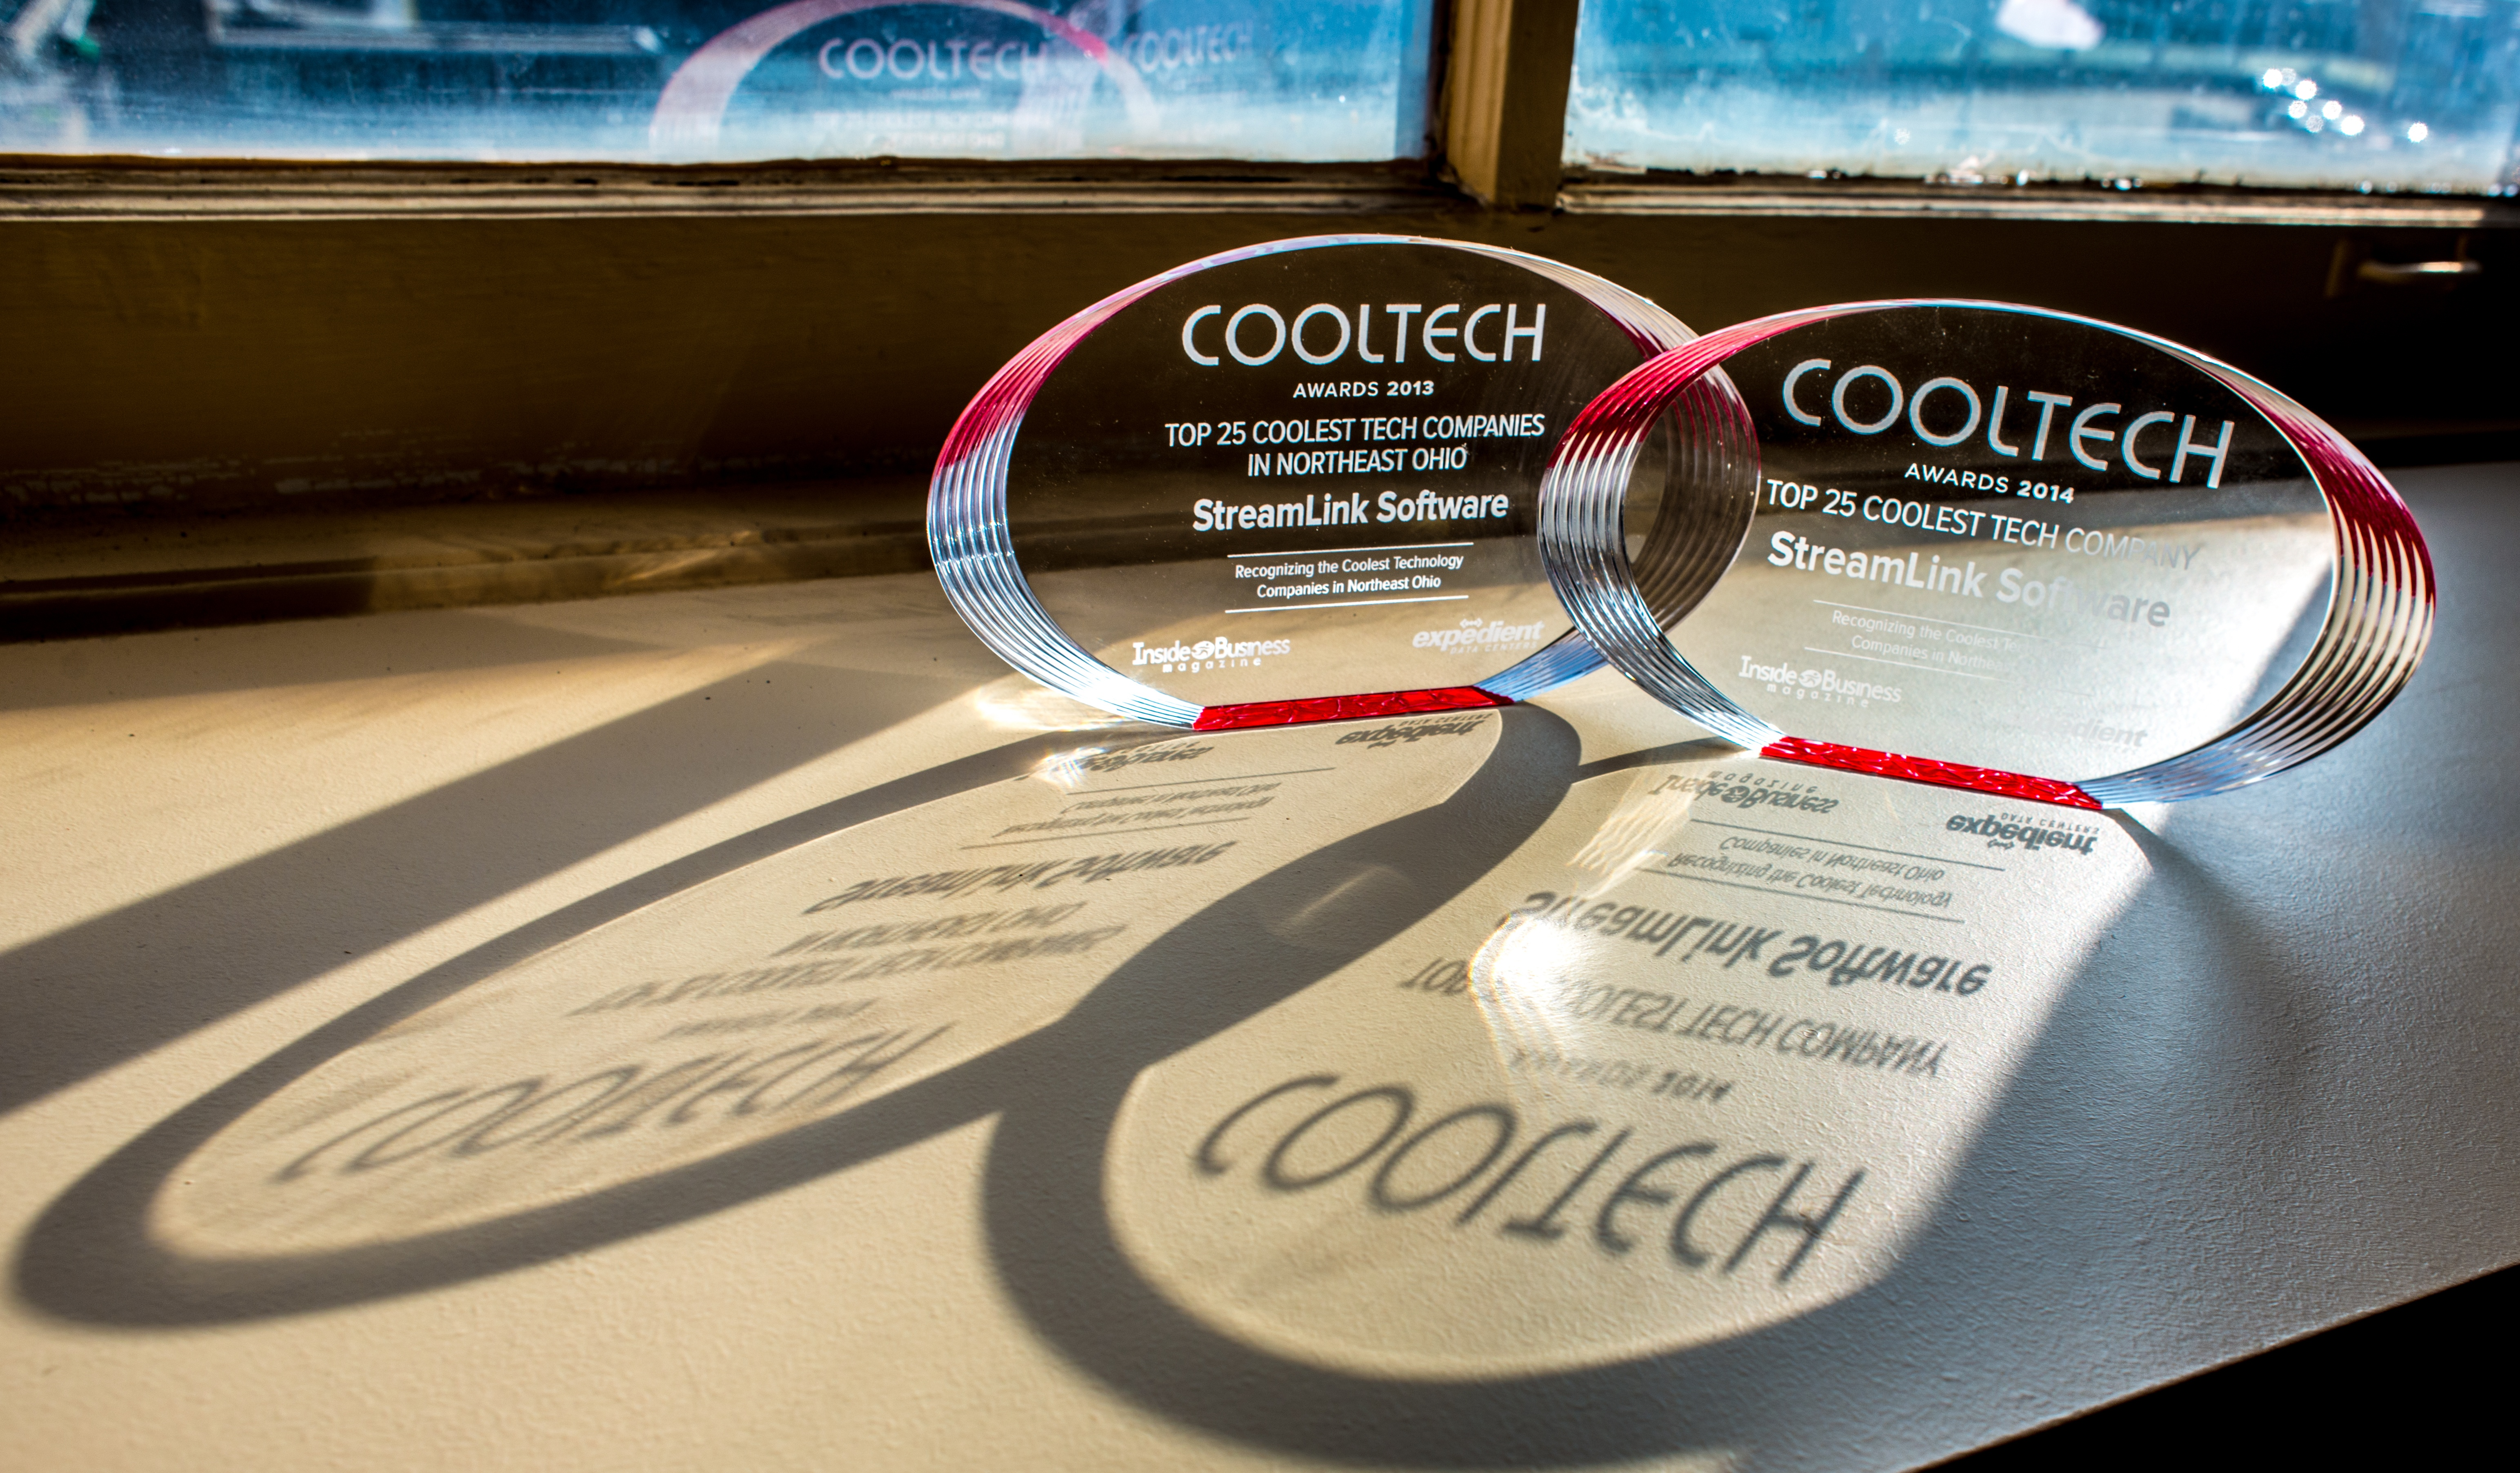 Cool Tech Award